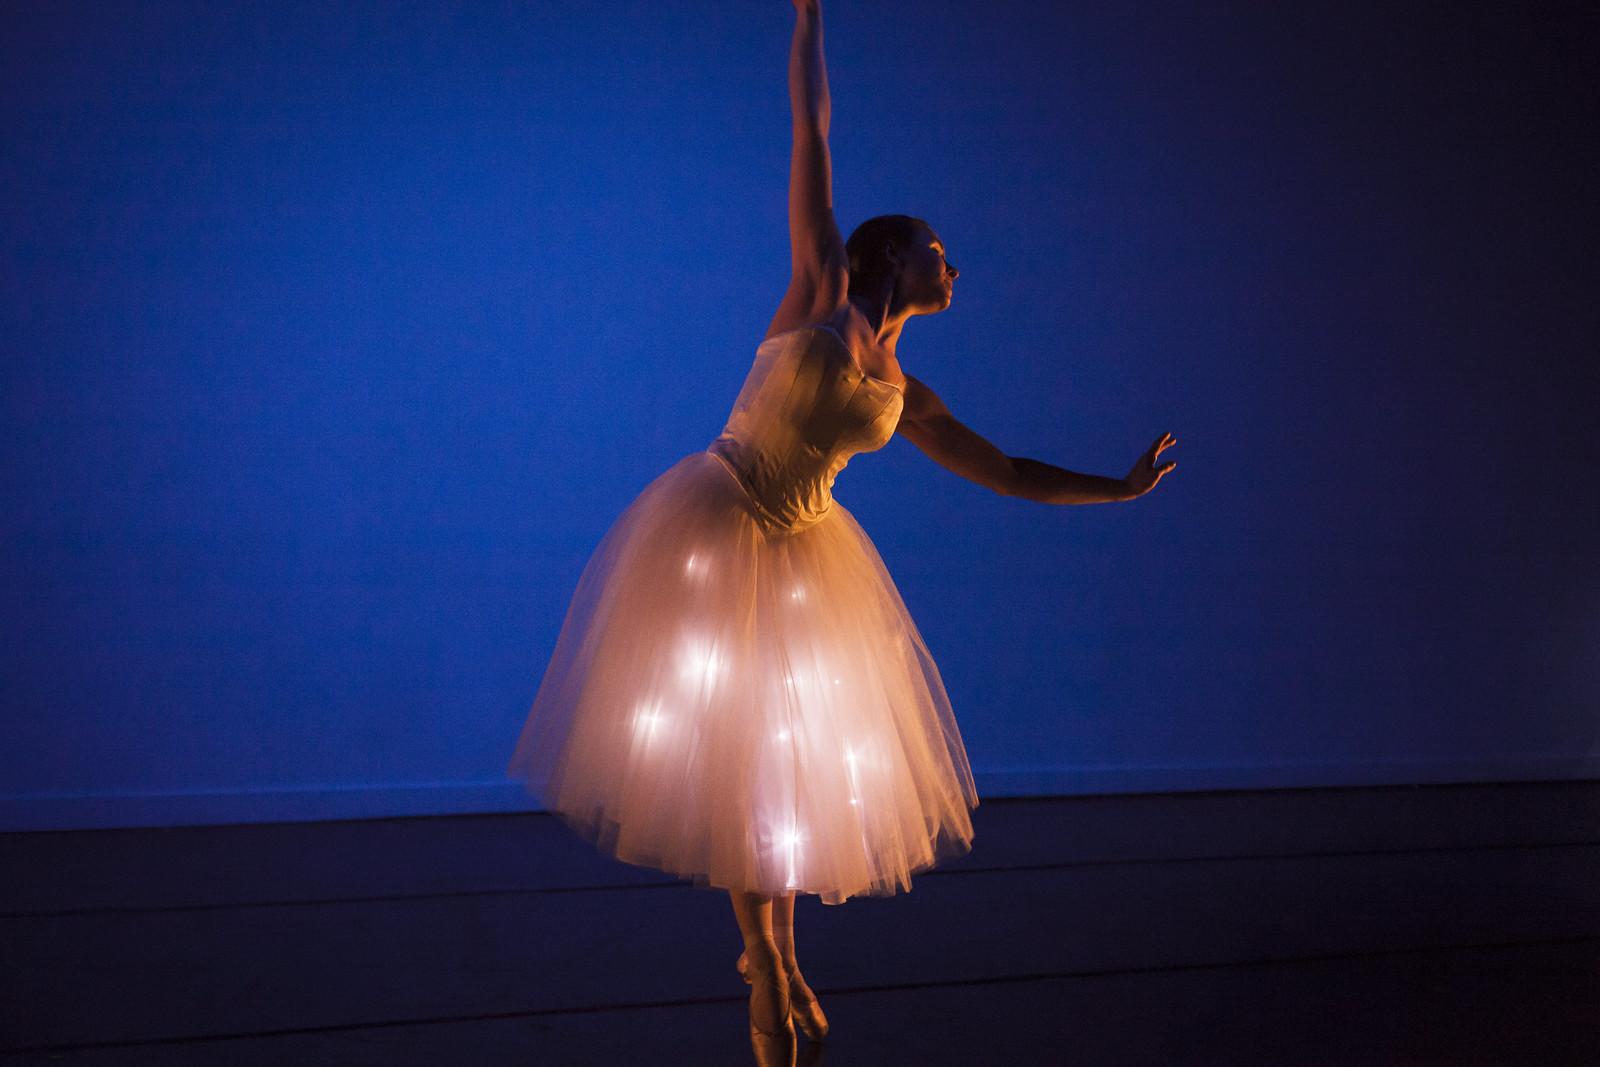 Illuminated tutu